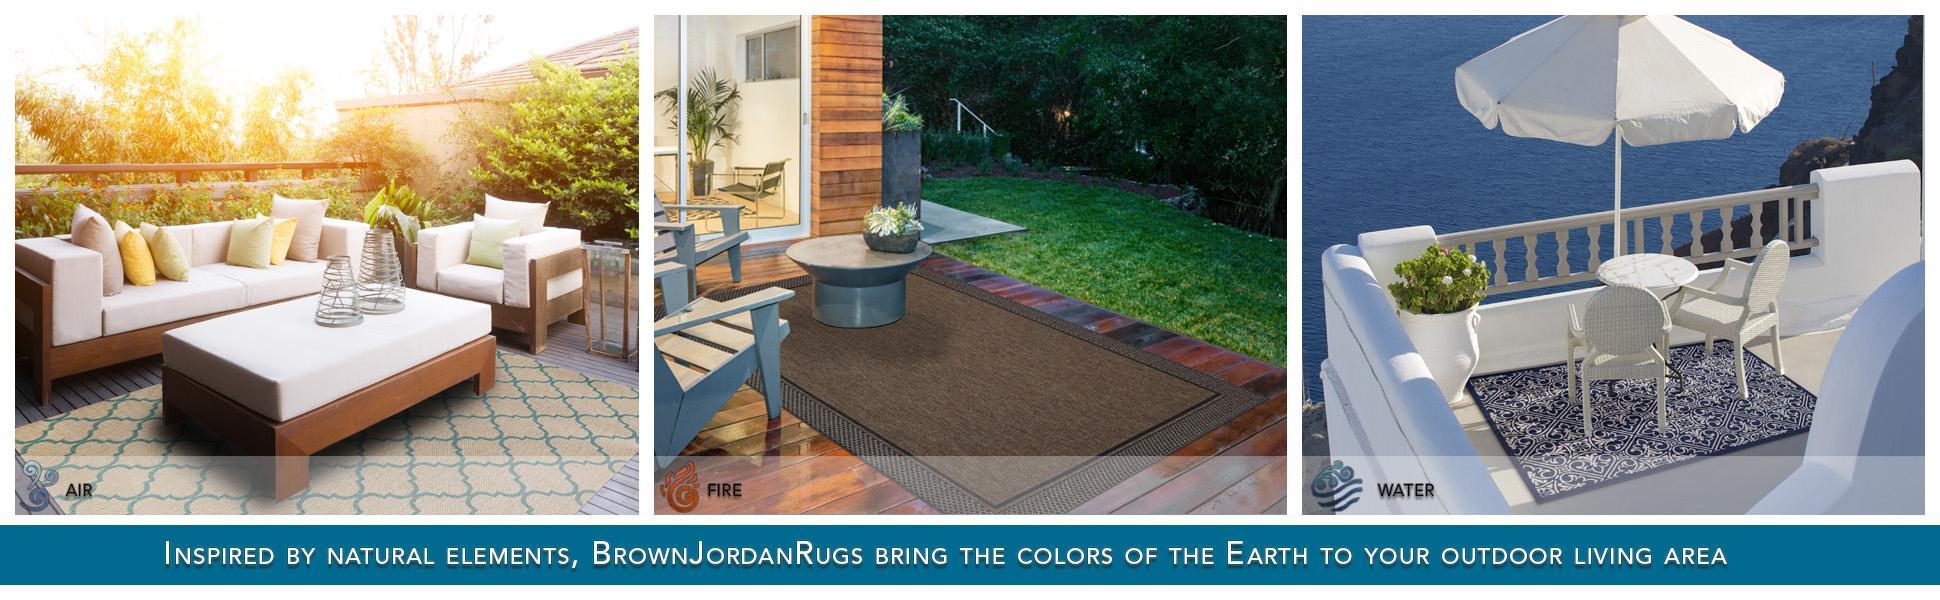 Amazon Brown Jordan Prime Label Outdoor Furniture Rug